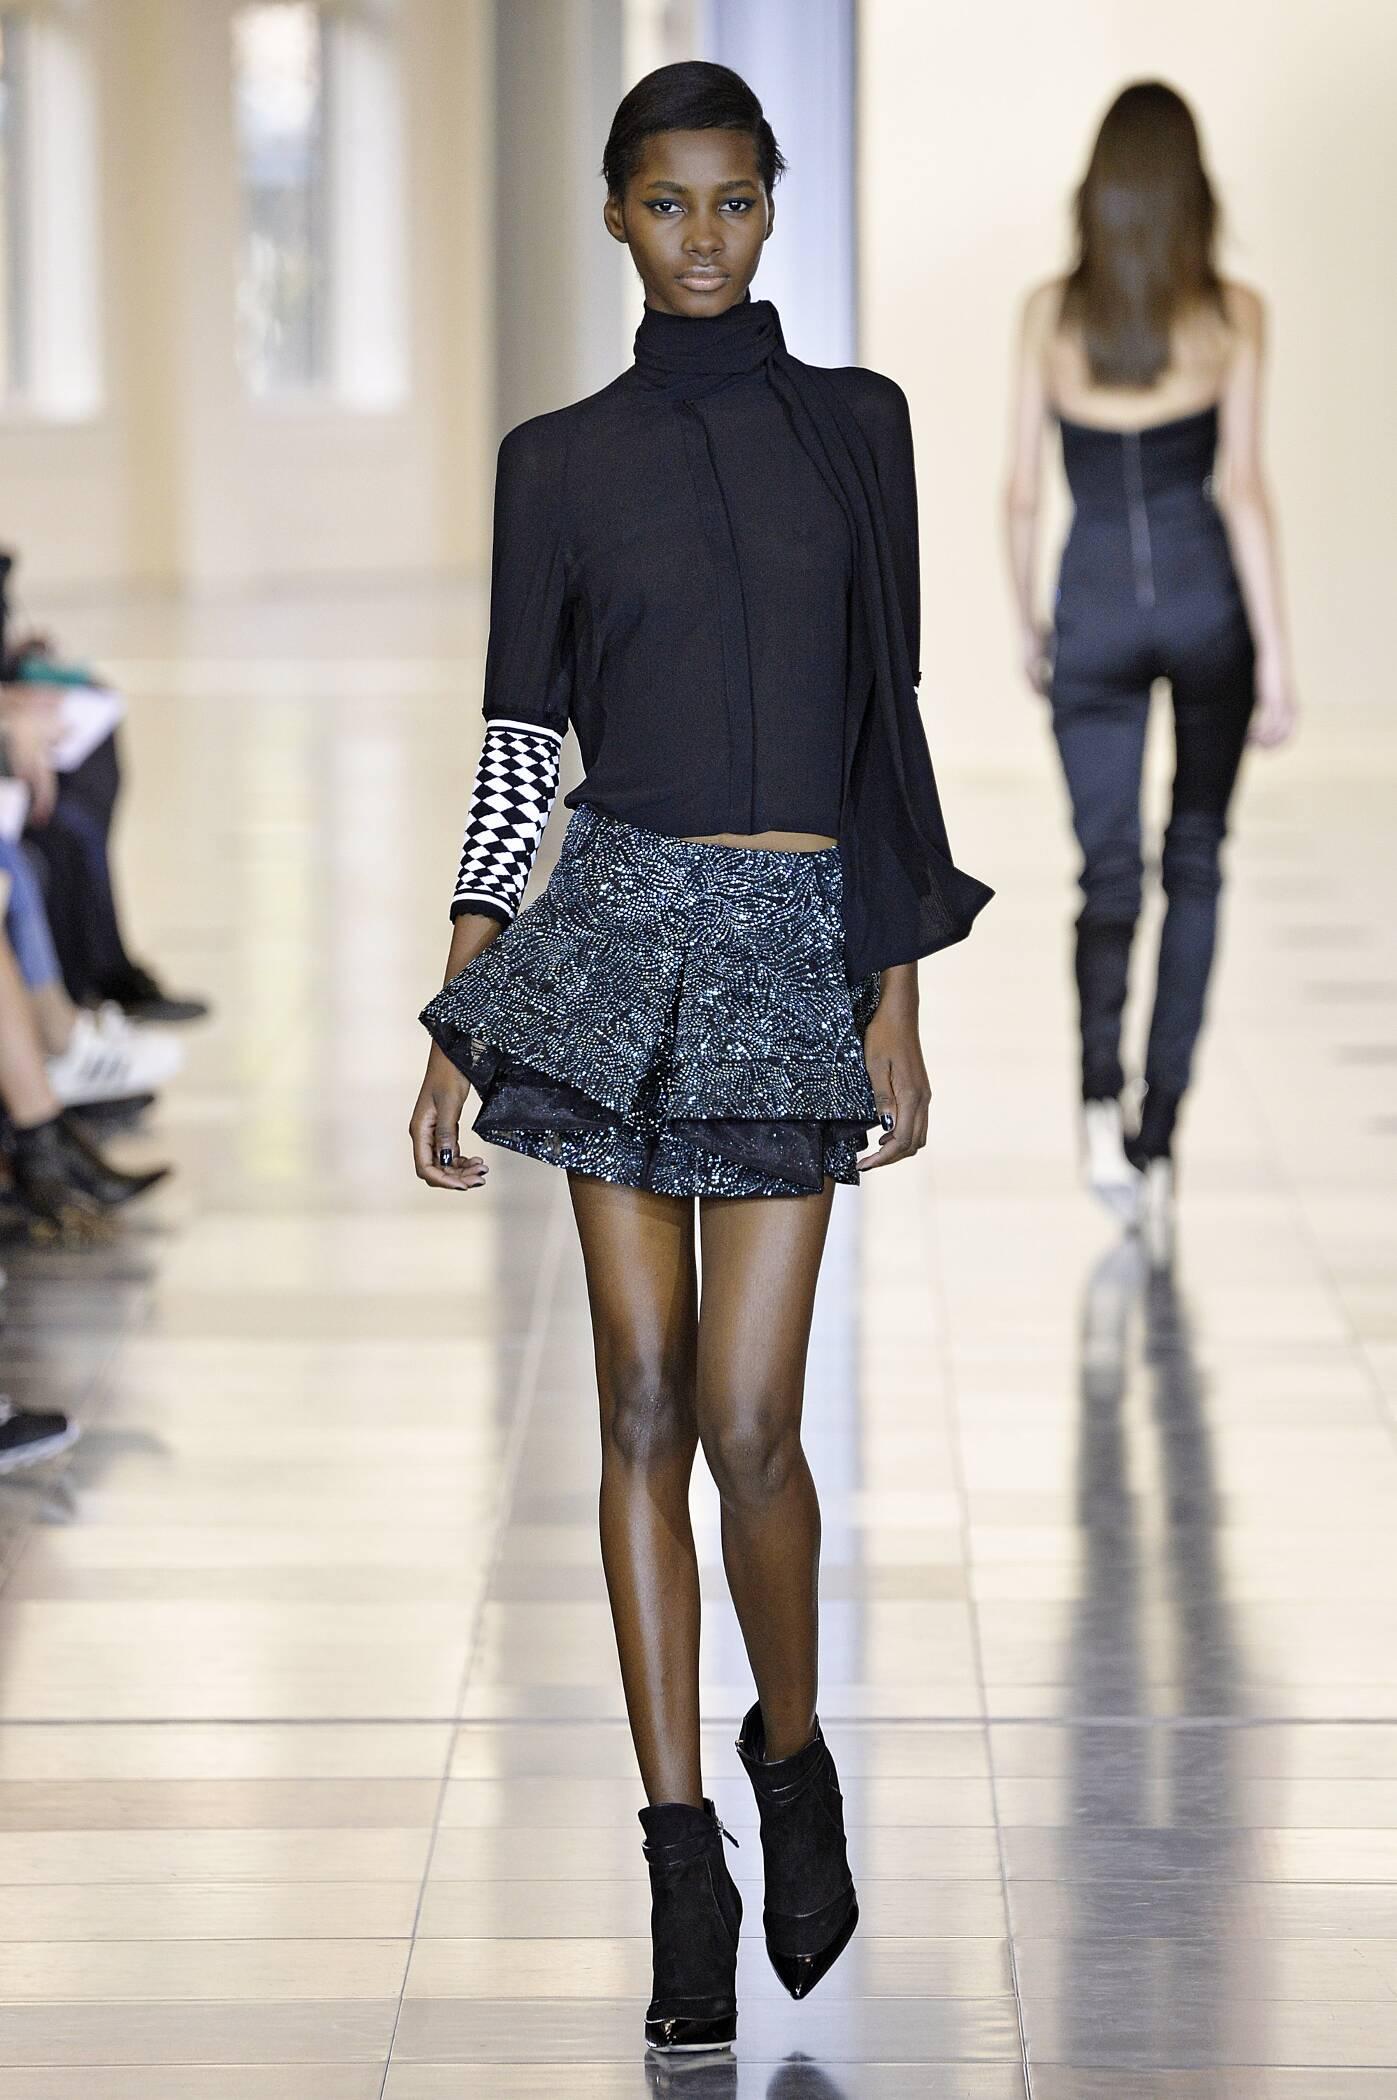 Fashion Show FW 2015 2016 Antonio Berardi Womenswear